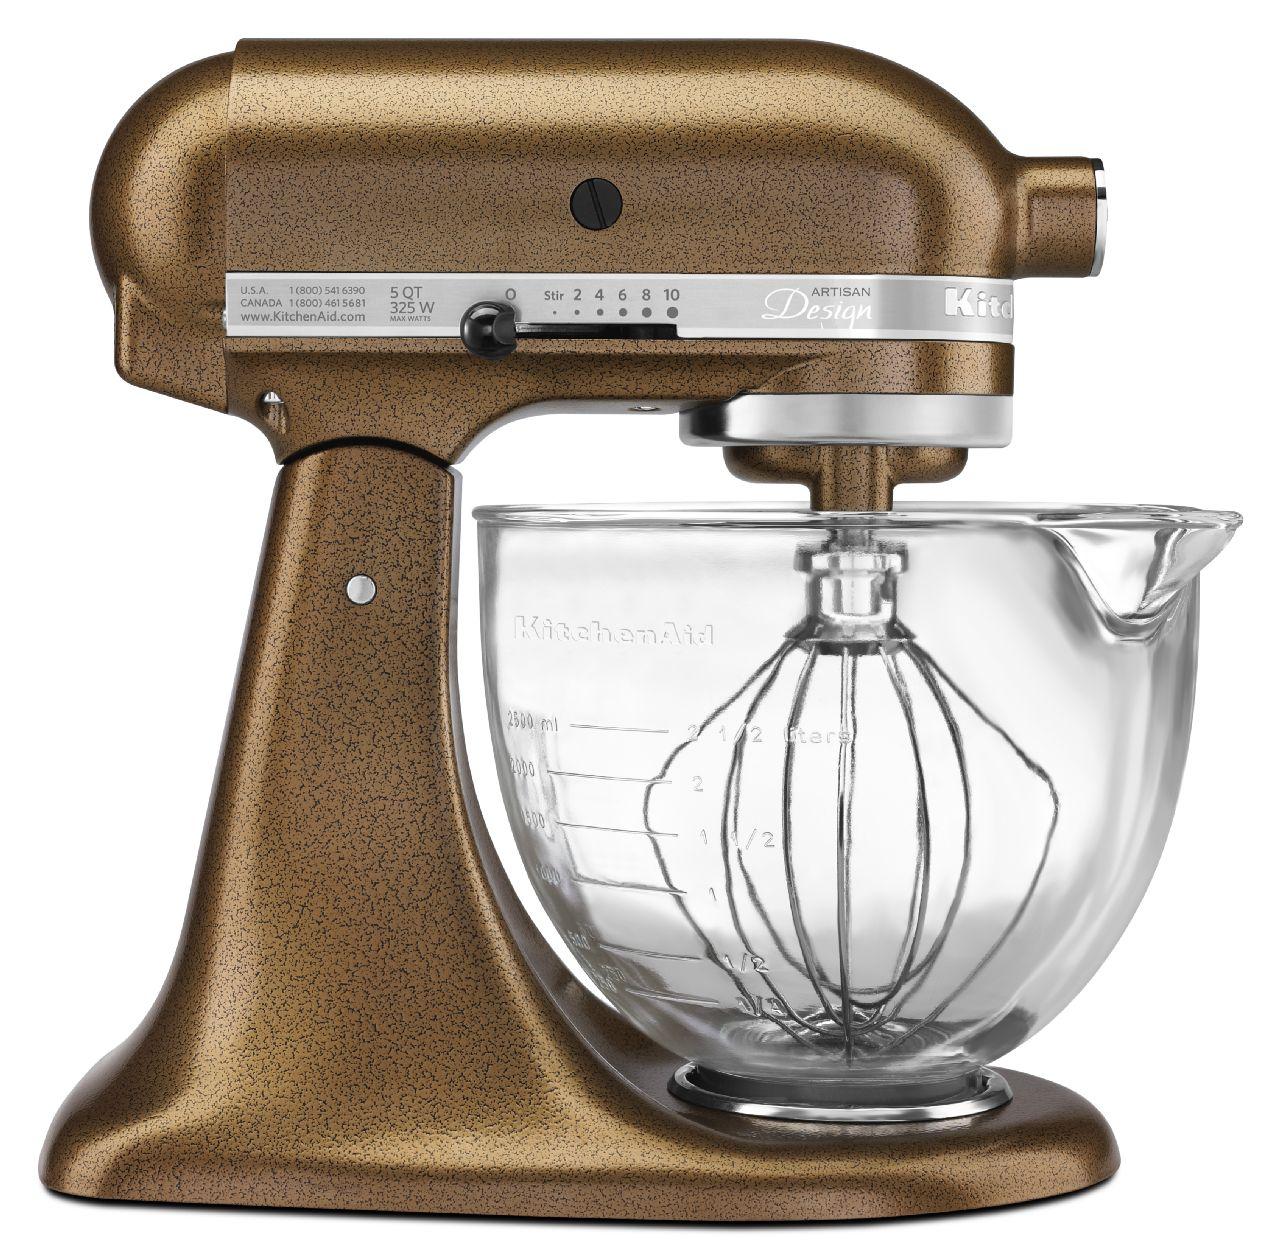 KitchenAid-Artisan-Design-Series-5-Quart-Tilt-Head-Stand-Mixer-with-Glass thumbnail 4